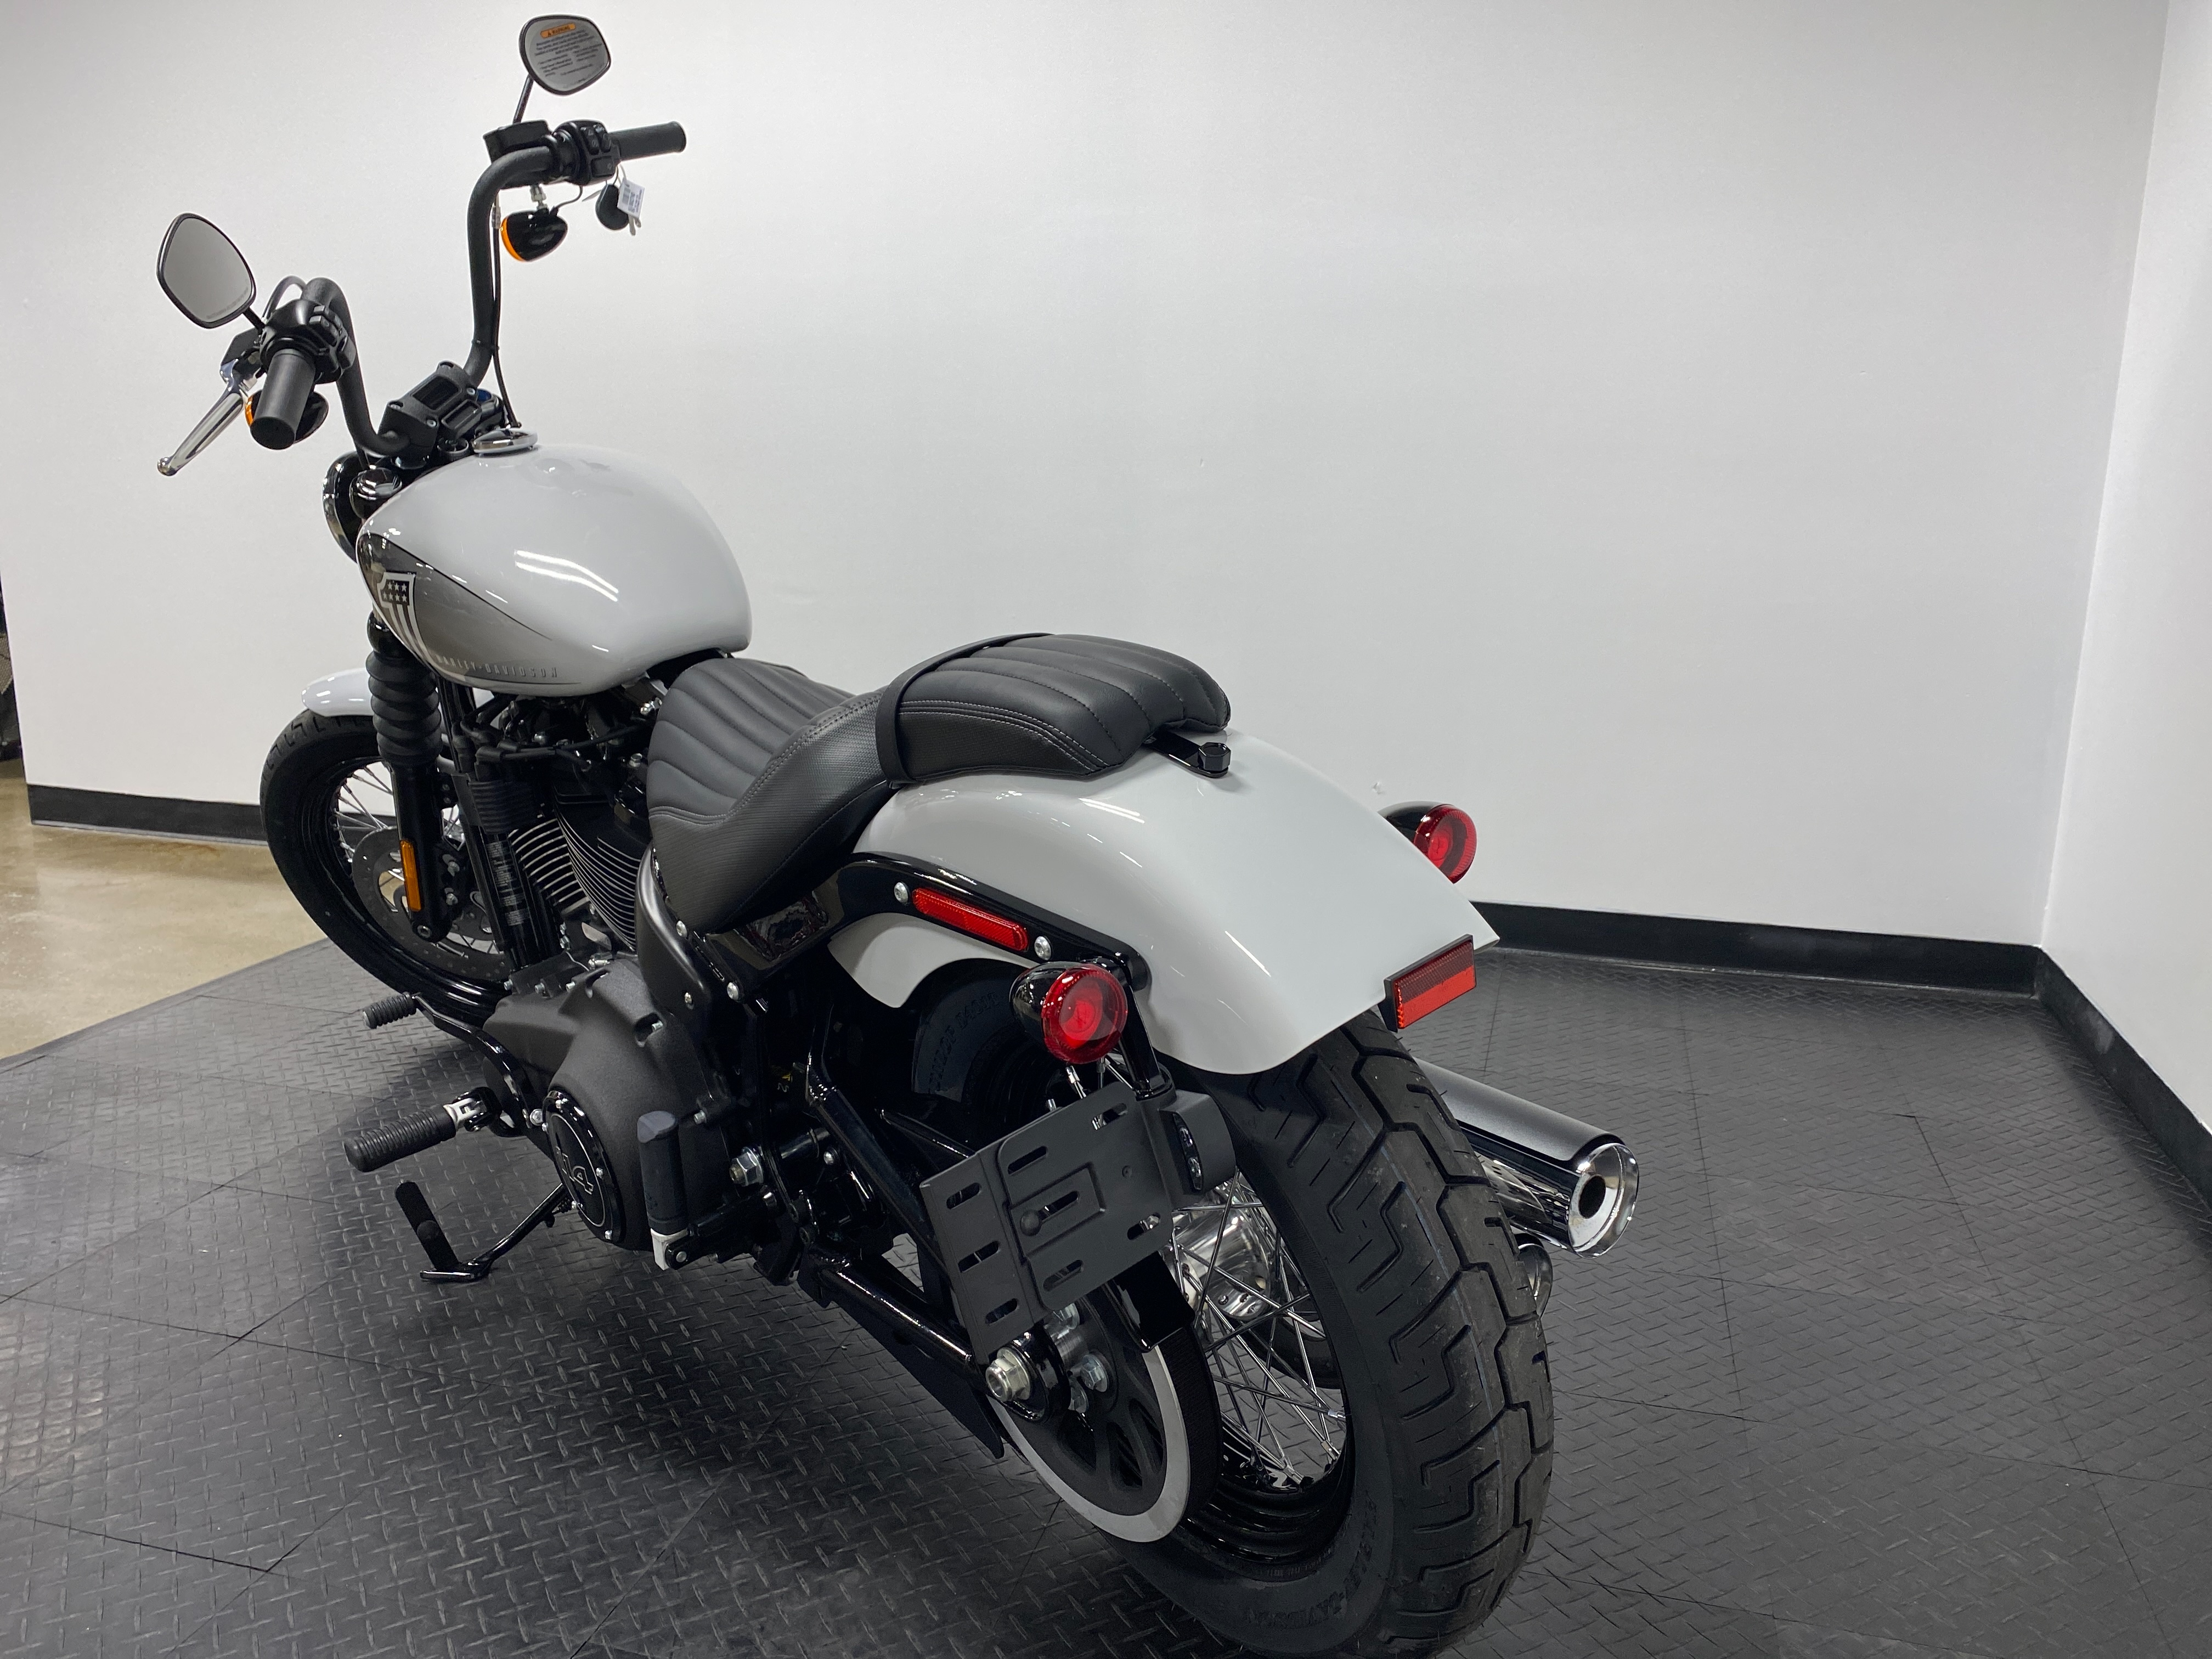 2021 Harley-Davidson Cruiser Street Bob 114 at cannonball harley-davidson